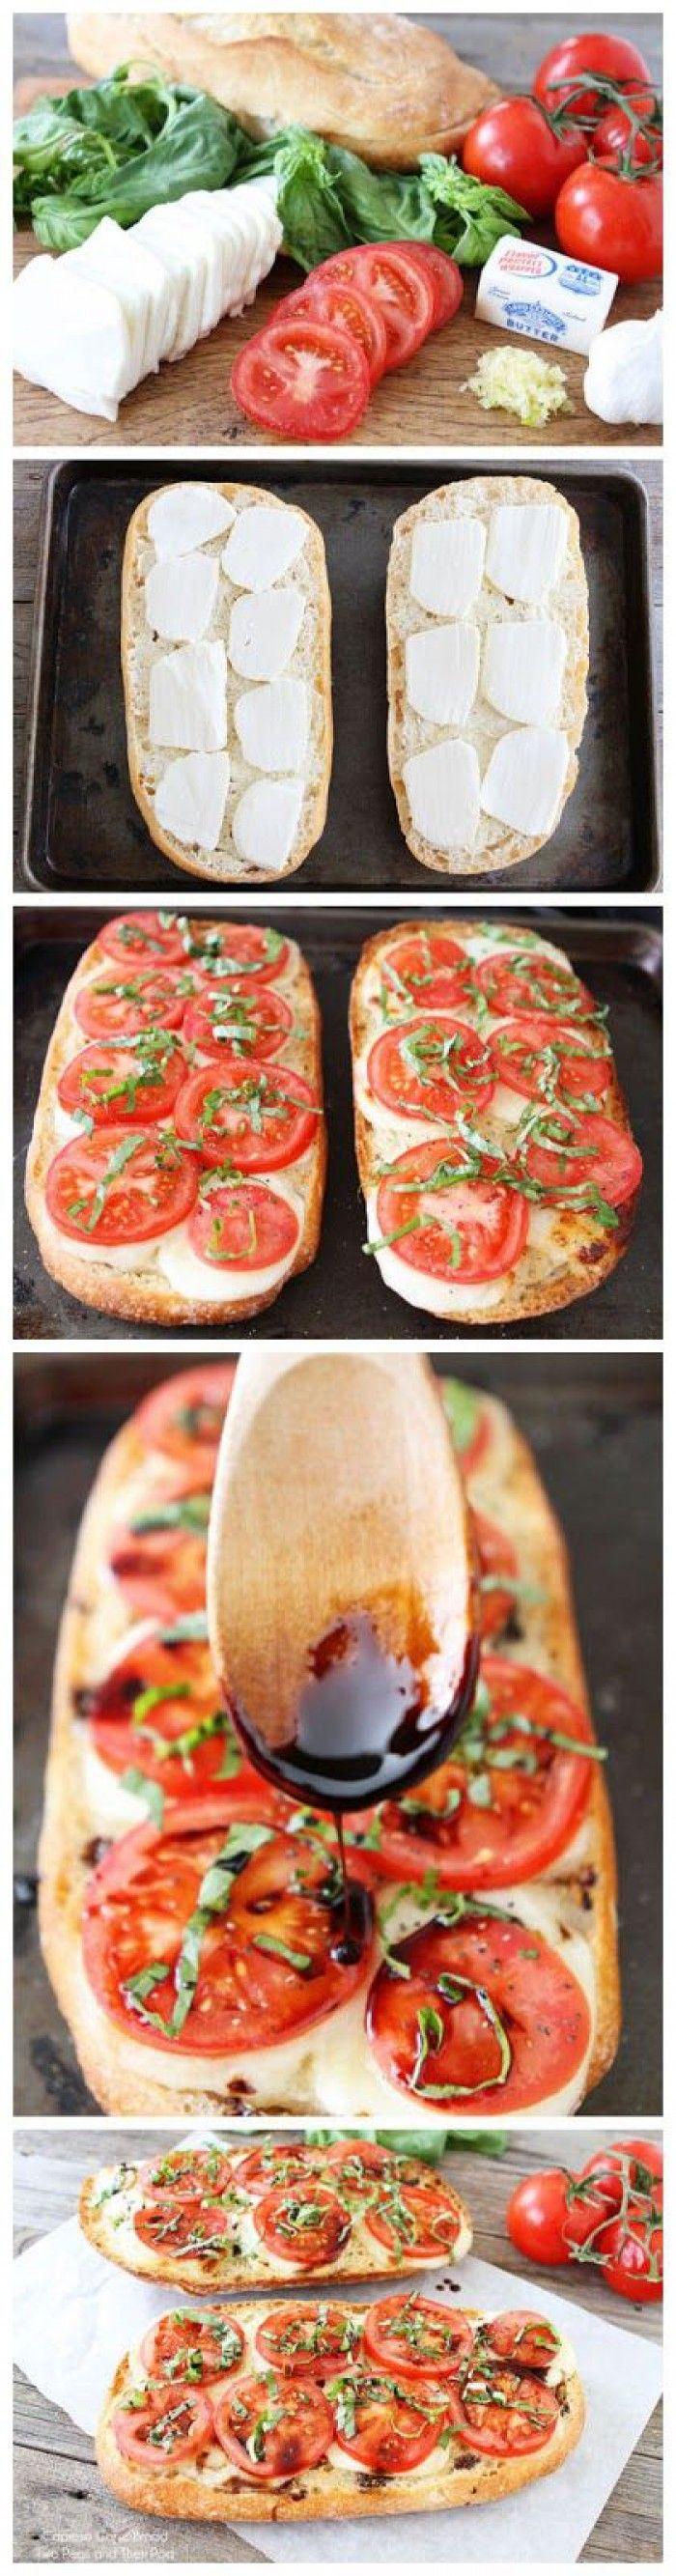 Knoblauch Brot